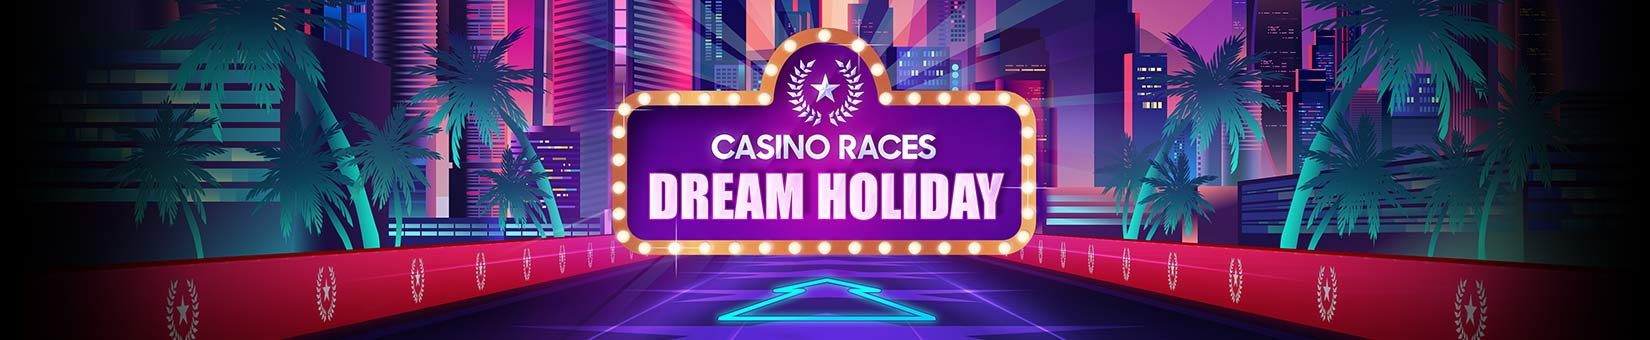 Casino races today torrent for casino